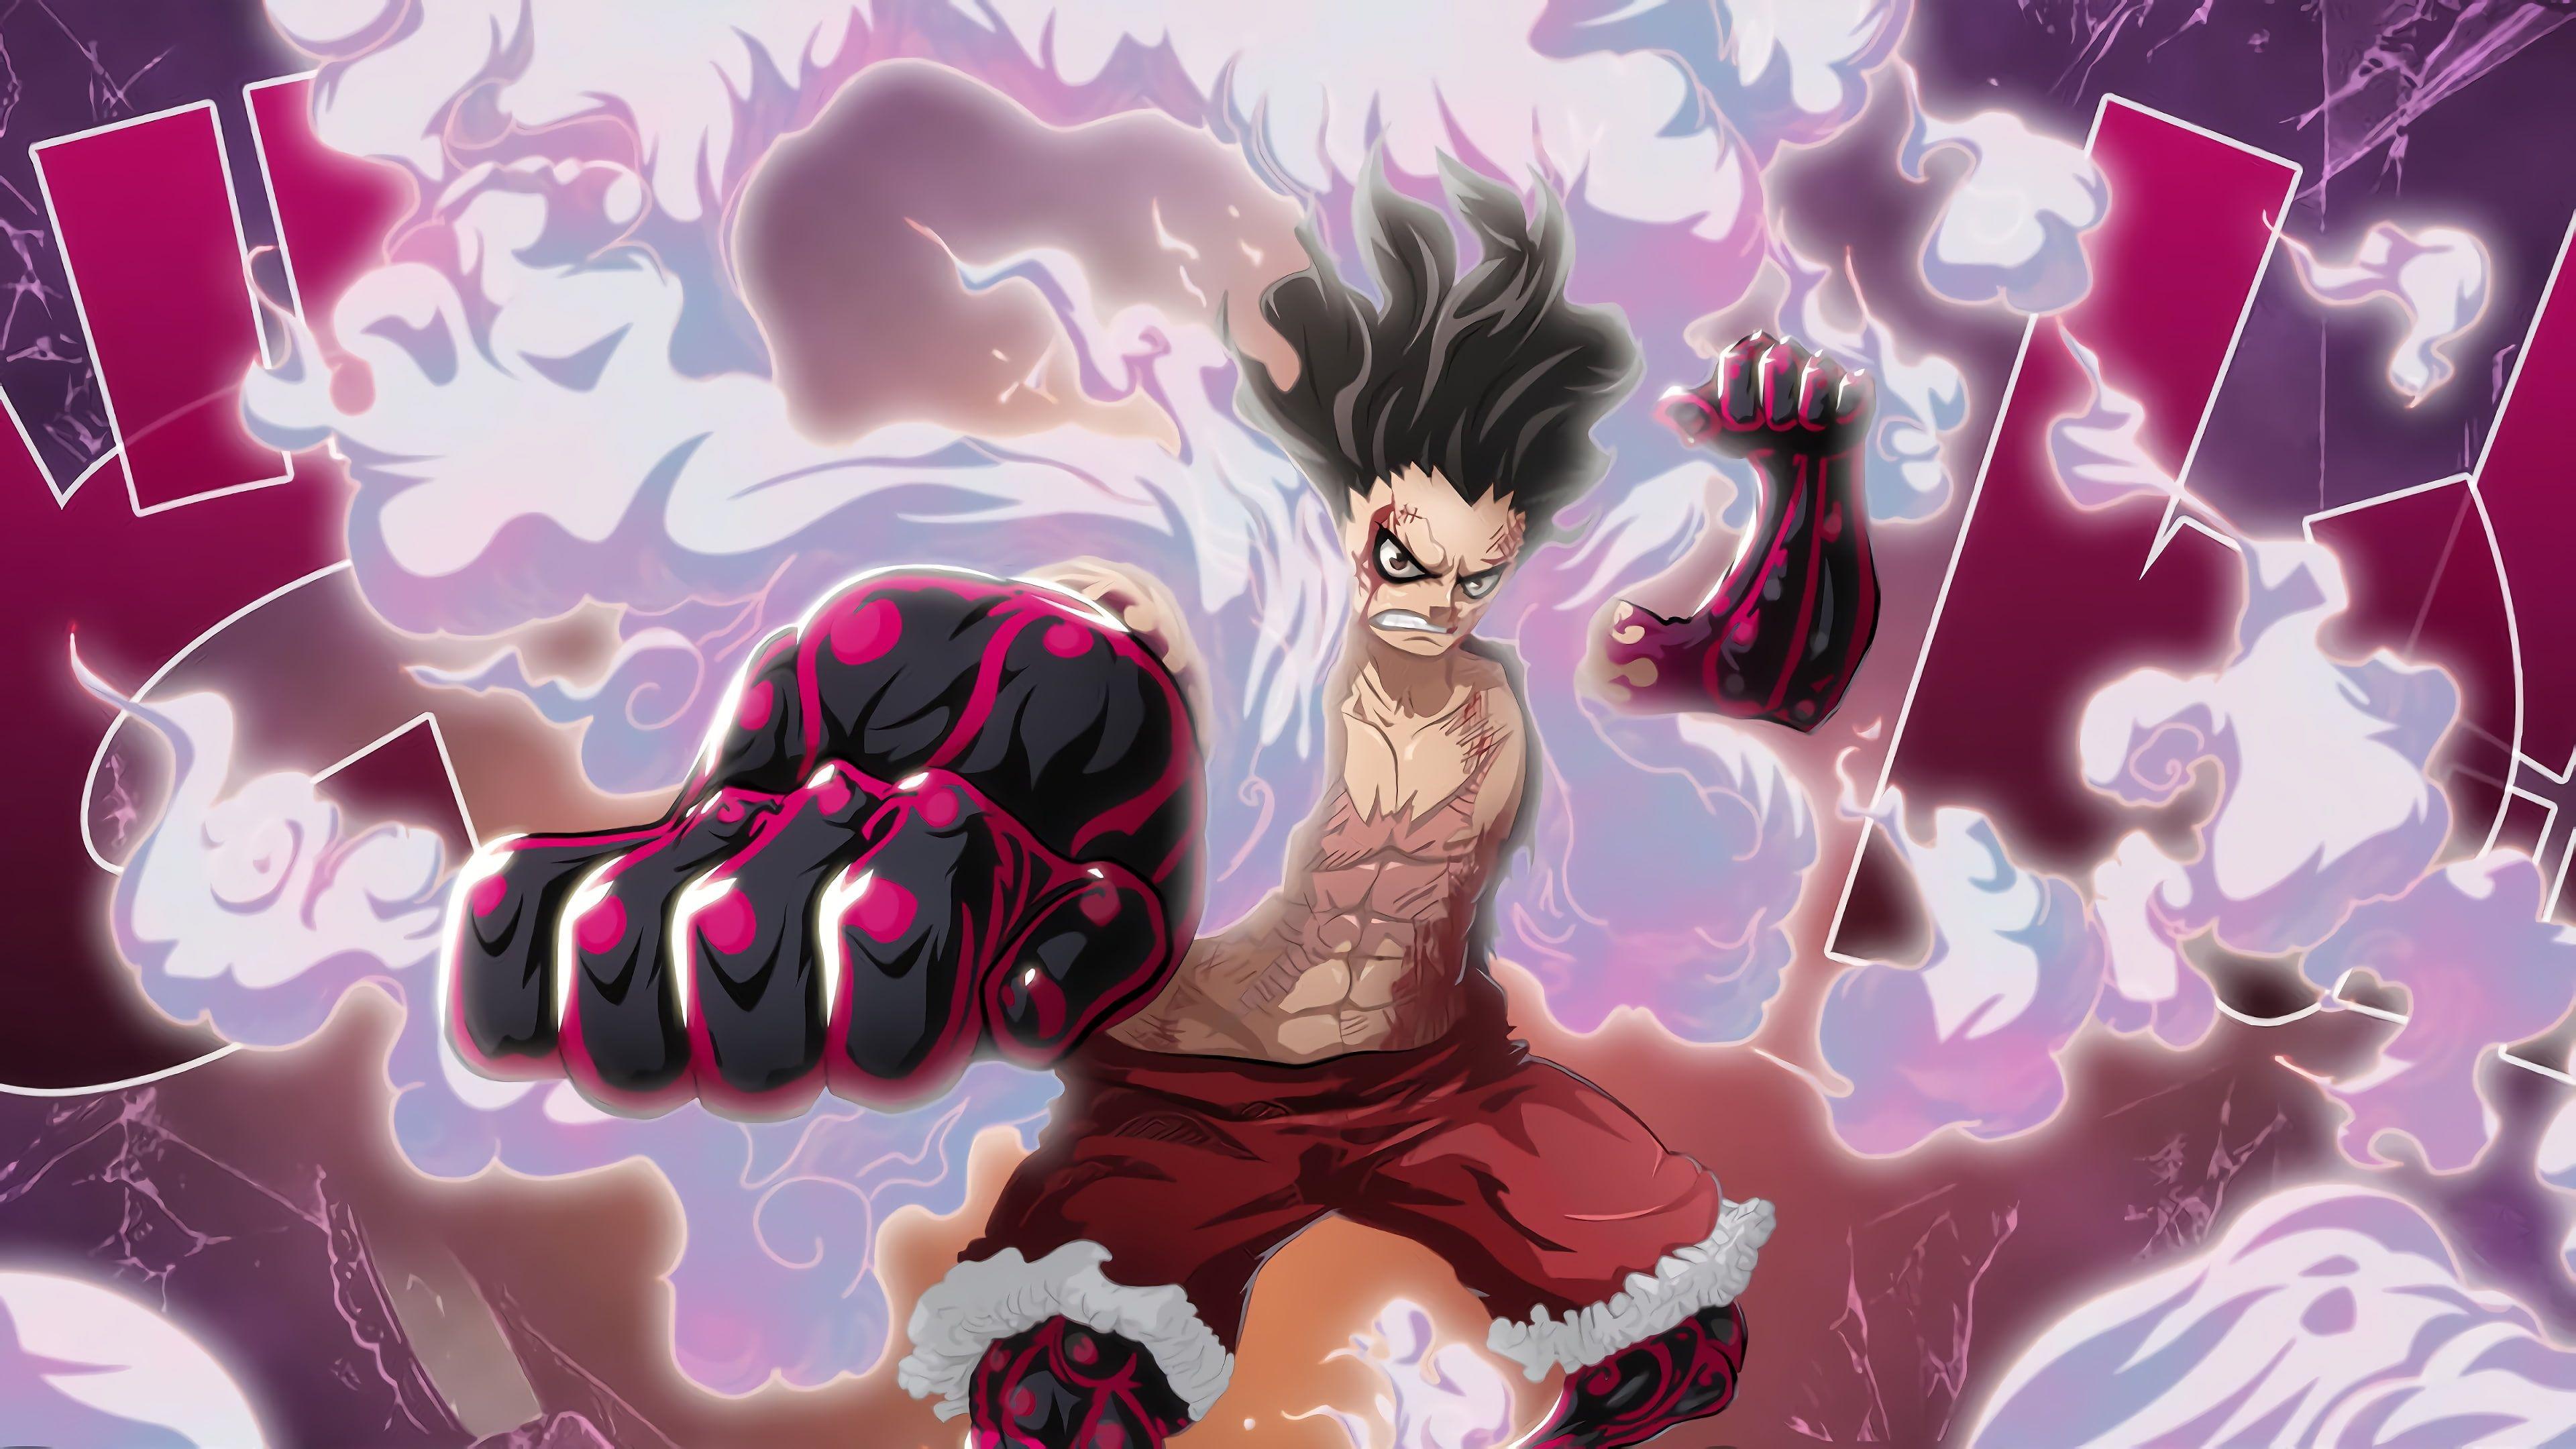 Berikut adalah spoiler one piece yang membahas tentang mode baru luffy bernama tiger man yang akan digunakan untuk melawan kaido. One Piece Monkey D Luffy Gear Fourth Snakeman 4k Wallpaper Hdwallpaper Desktop Anime Luffy Gear Fourth Luffy